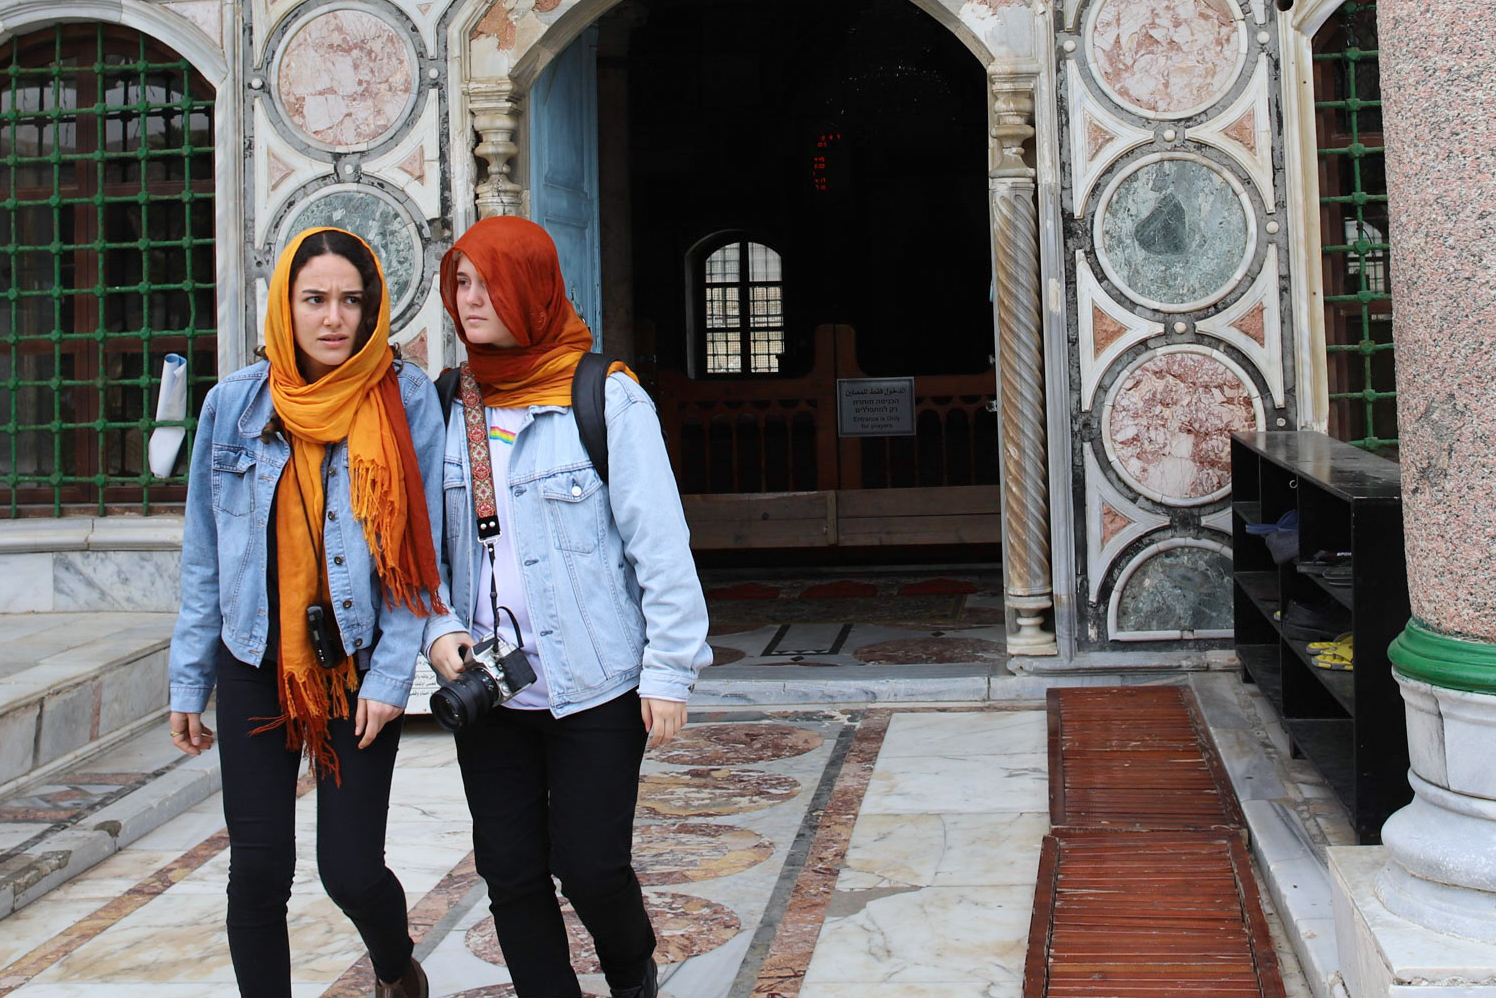 TravelMagazine.org presents works of nomad photographers